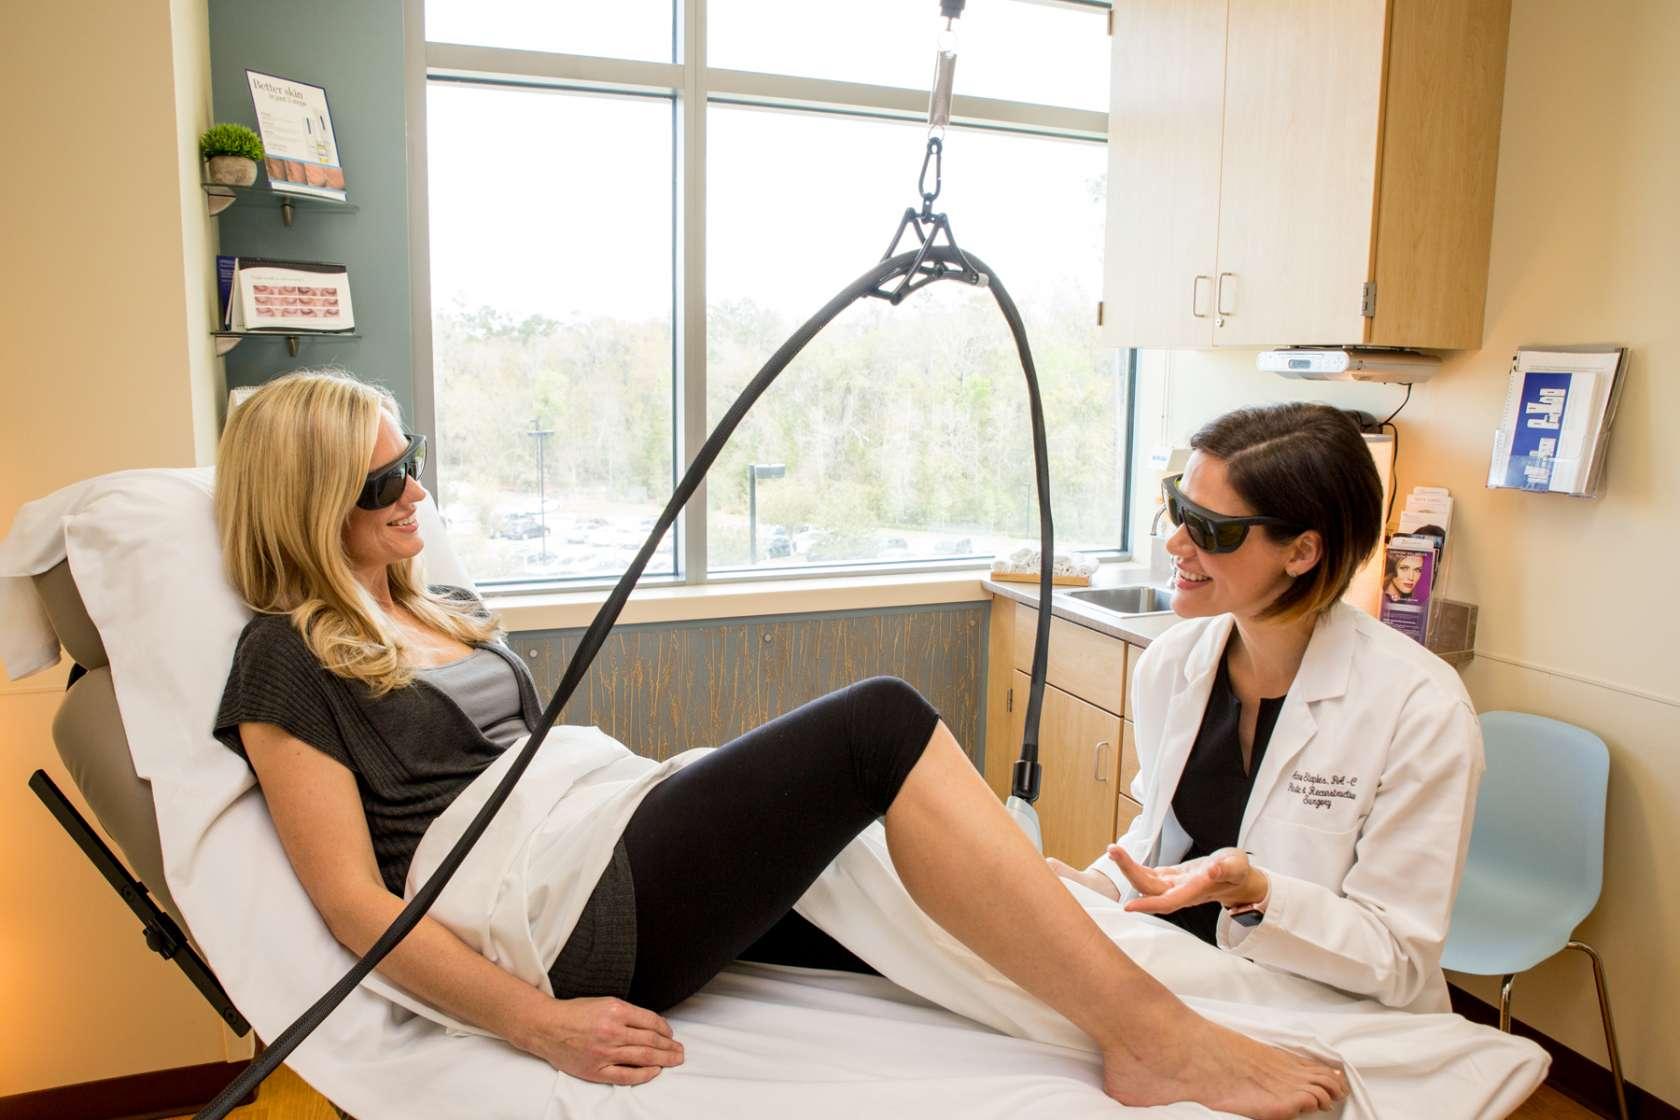 Woman having a leg procedure done